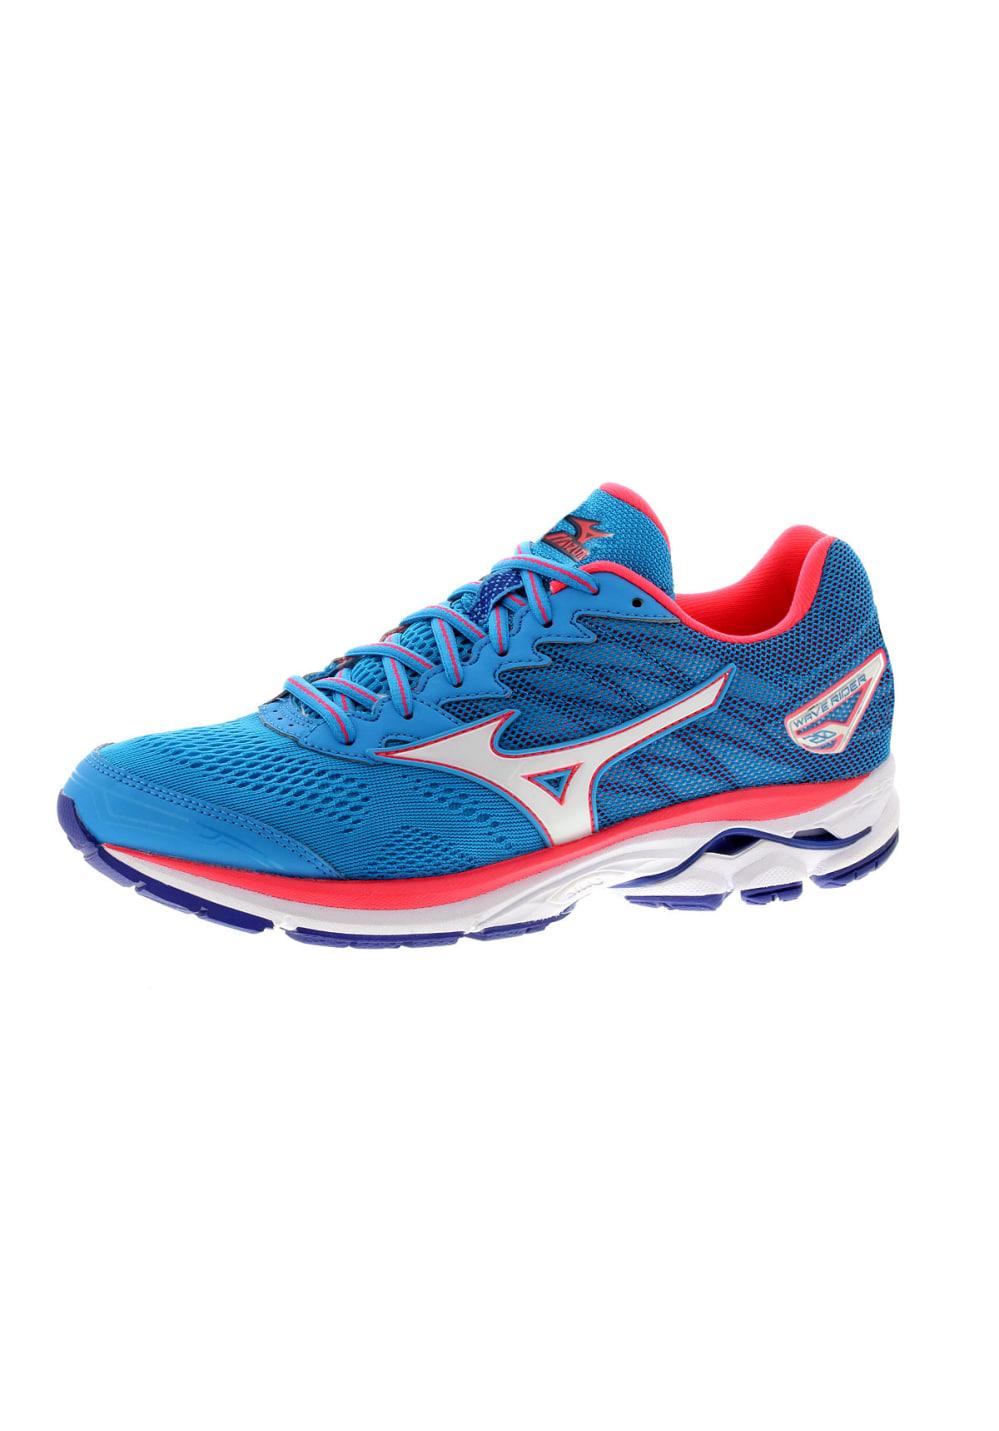 Mizuno Wave Rider 20 - Running shoes for Women - Blue  6b0c0e9653951